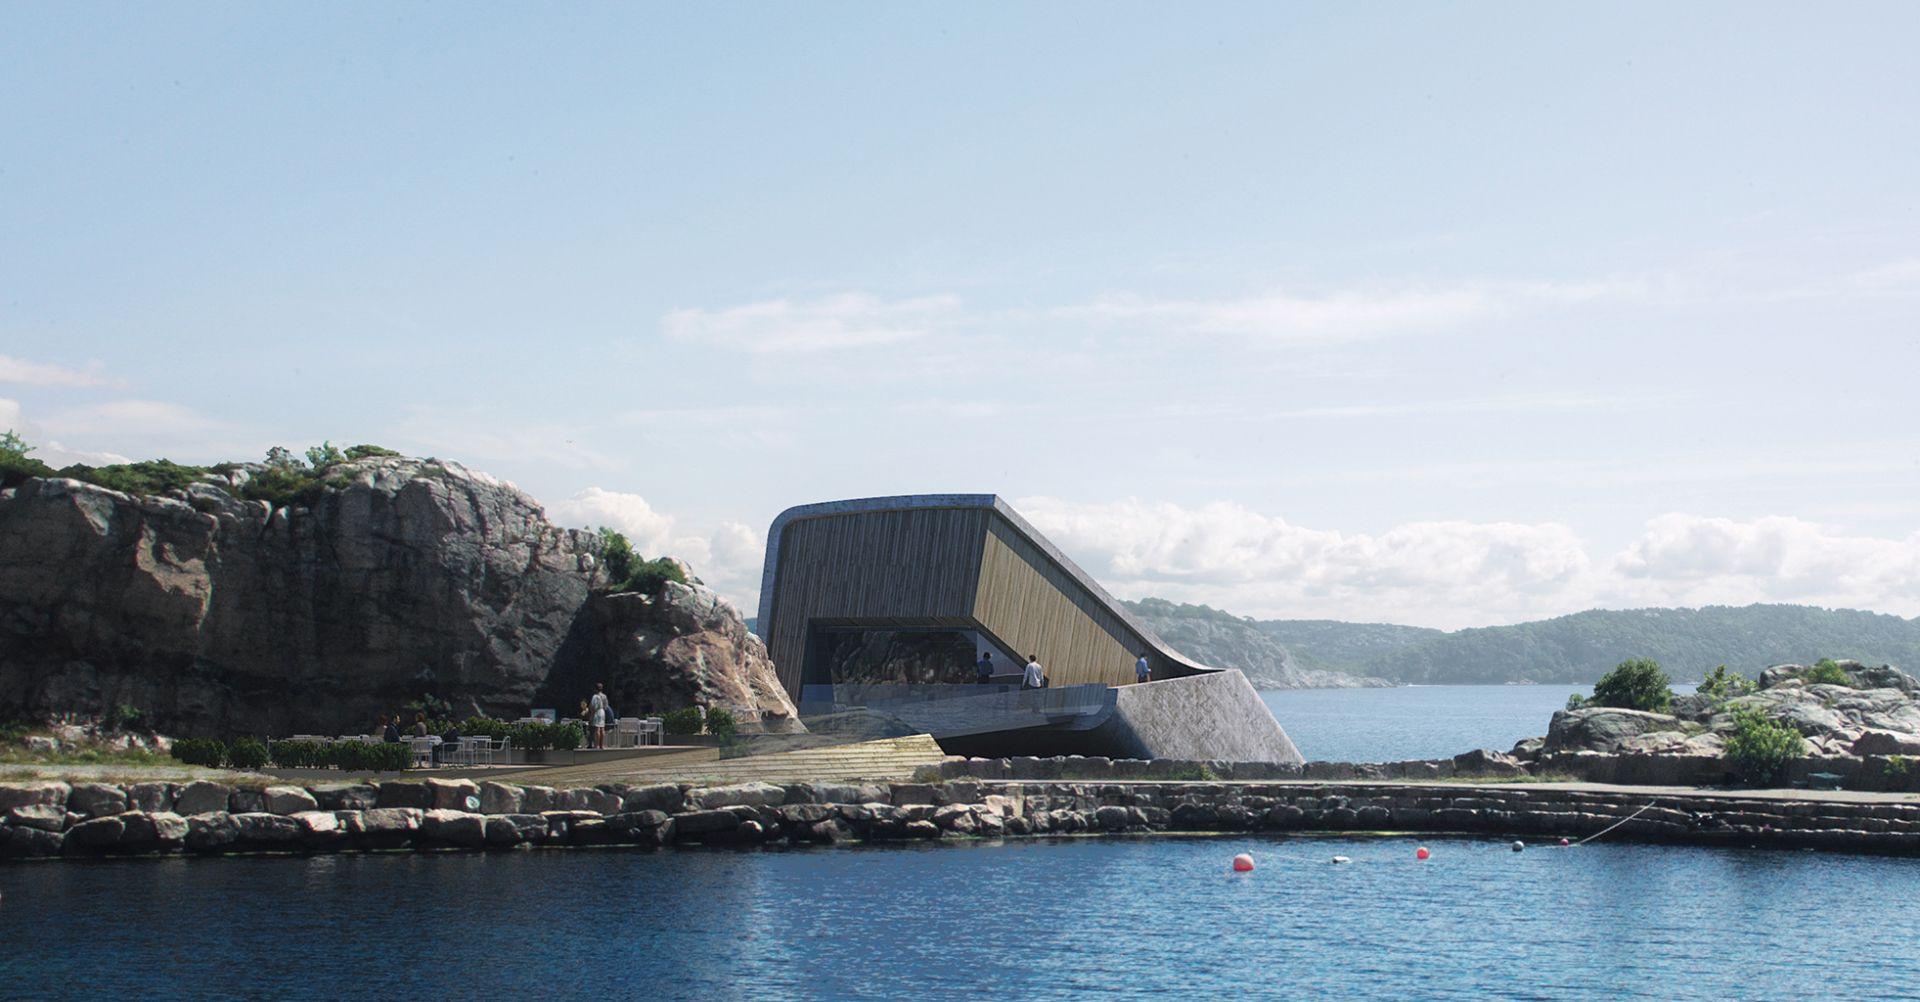 World's largest underwater restaurant poised to make remote Norwegian coast culinary hotspot